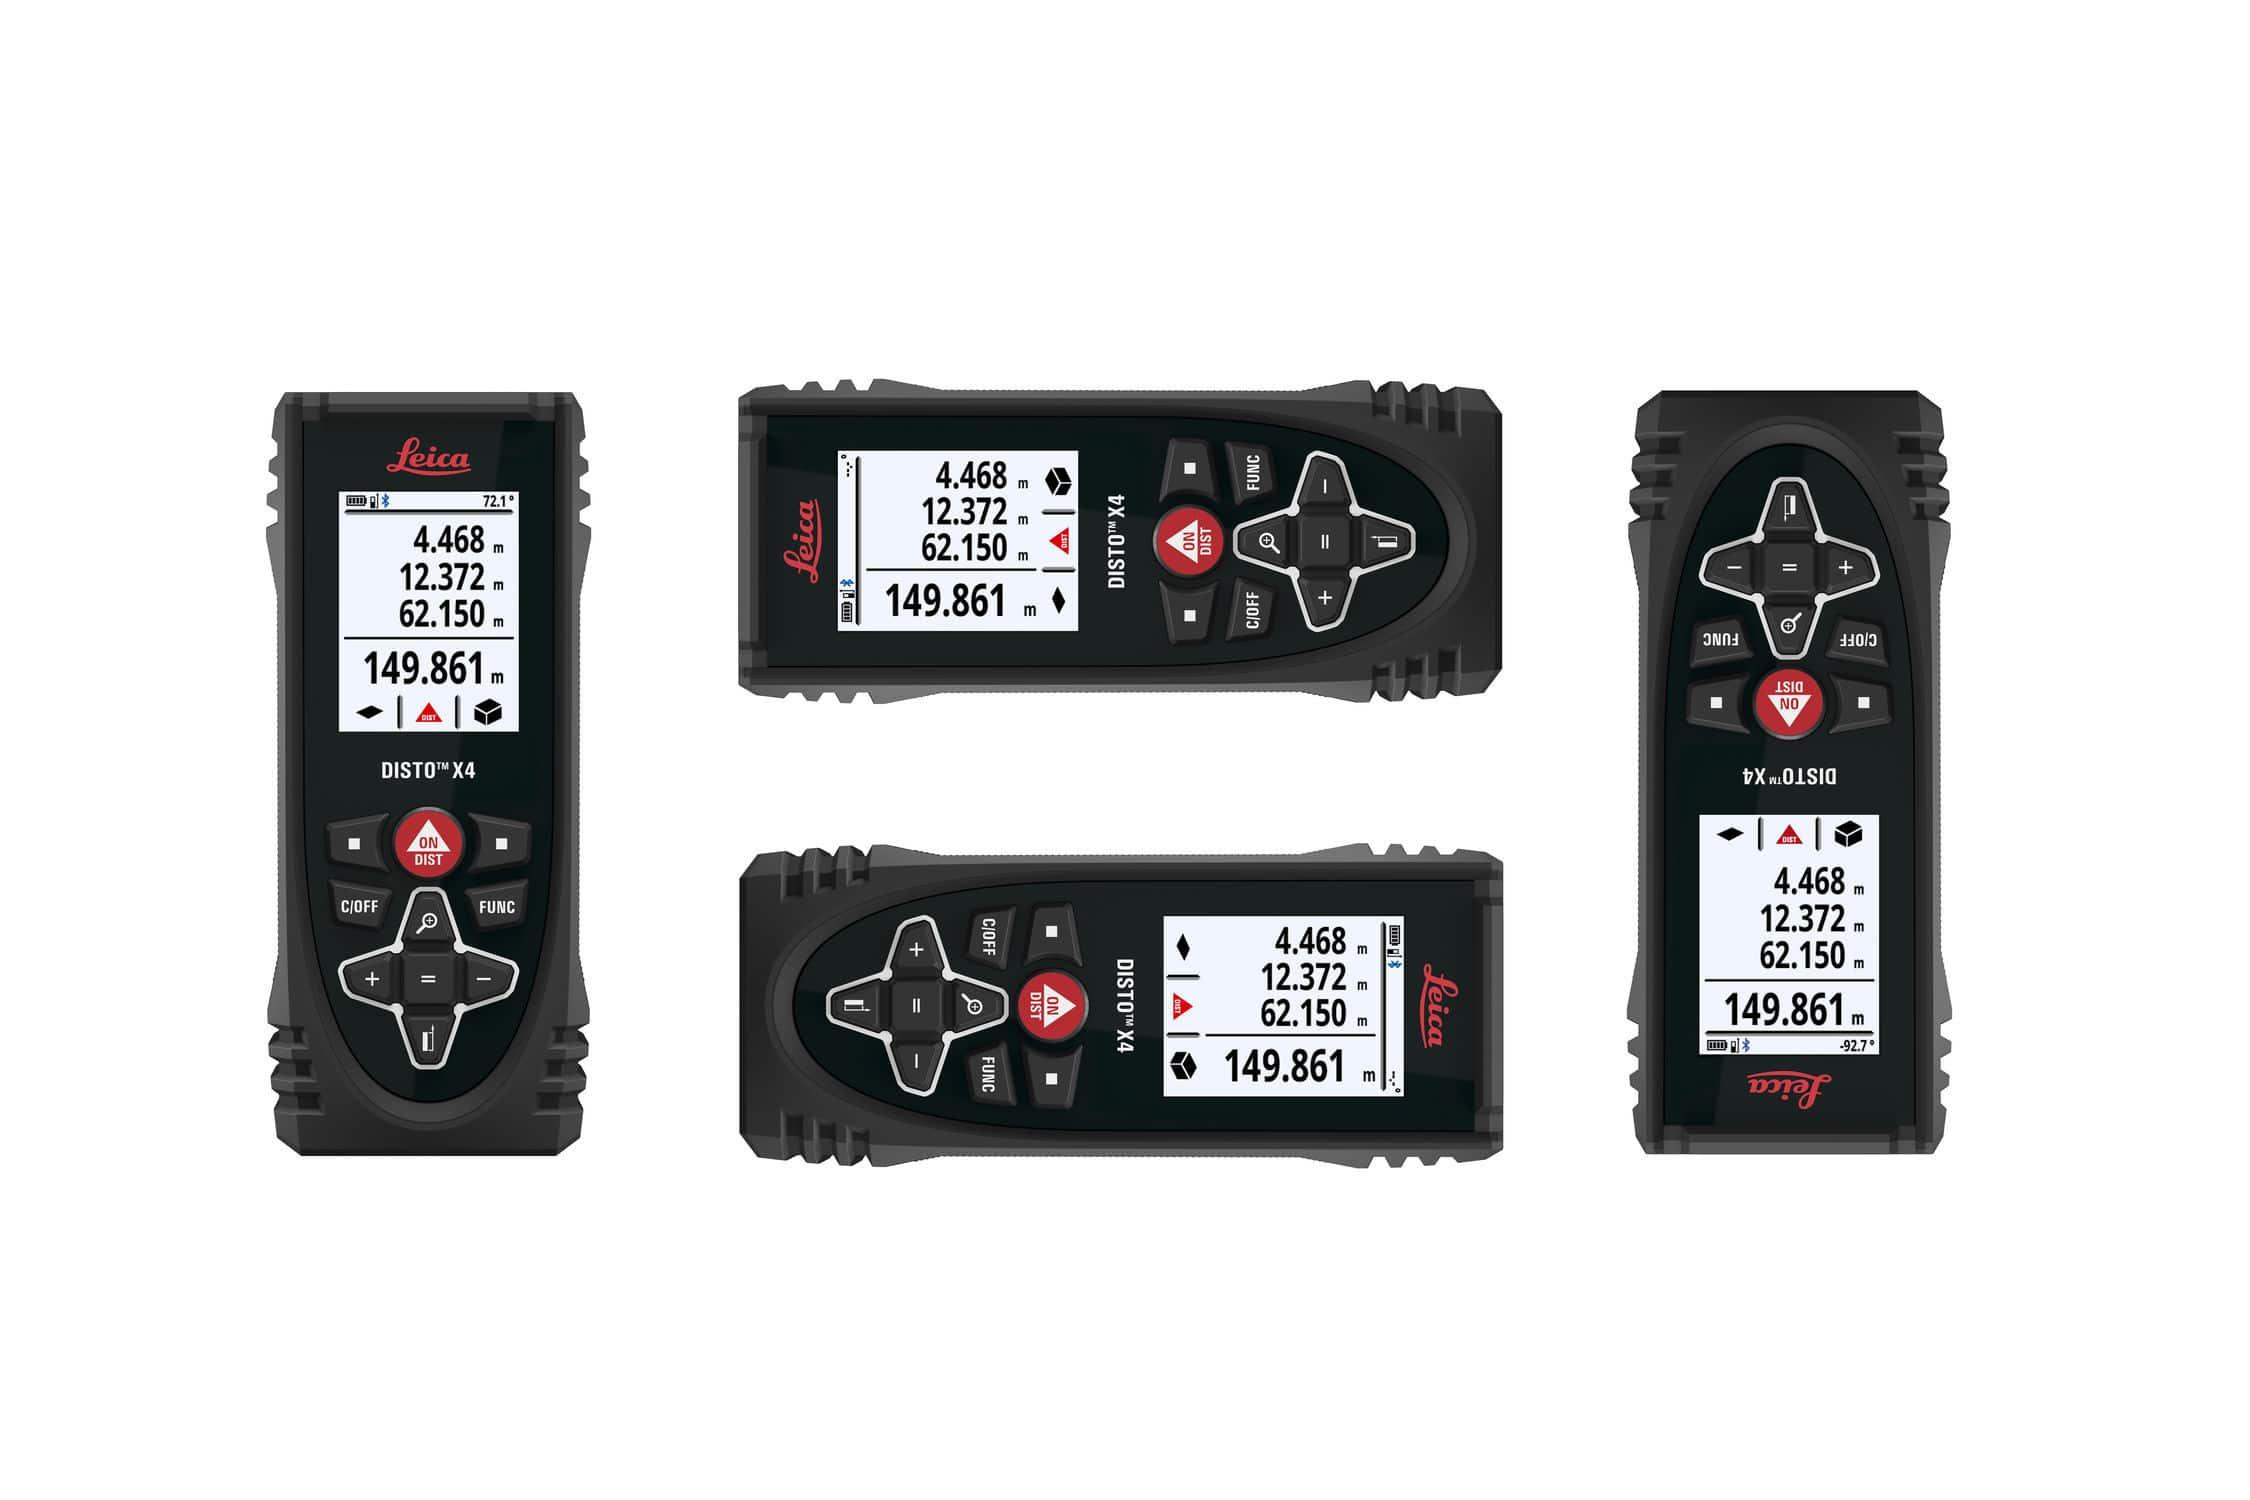 Leica Entfernungsmesser D510 : Review leica bluetooth laser disto d und catsmobil